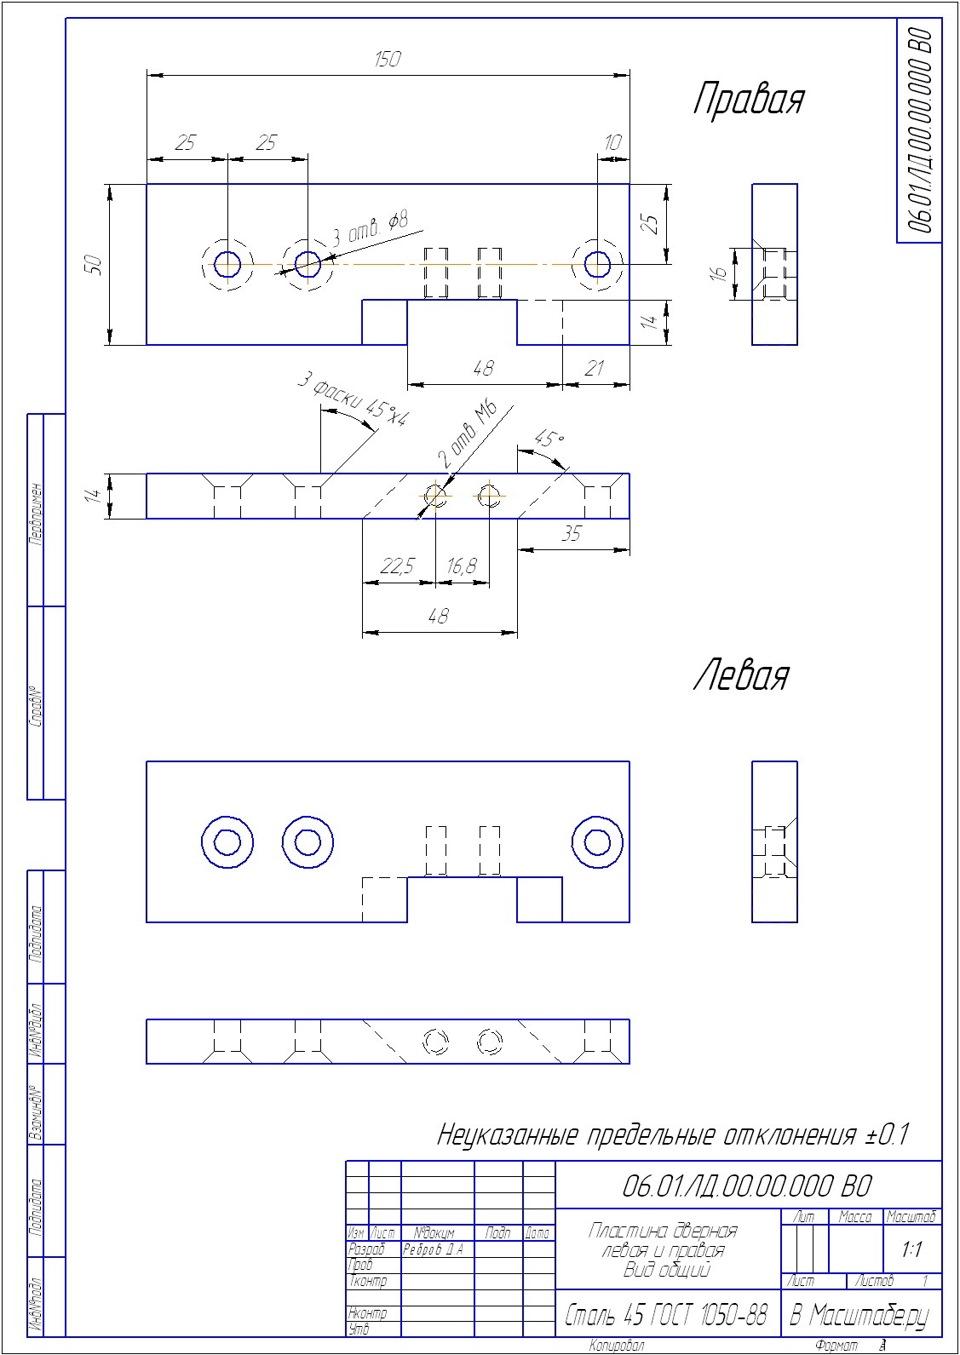 Ламбо двери своими руками (чертежи петель) - logbook Lada 2108 БАГИРА 1992 on DRIVE2